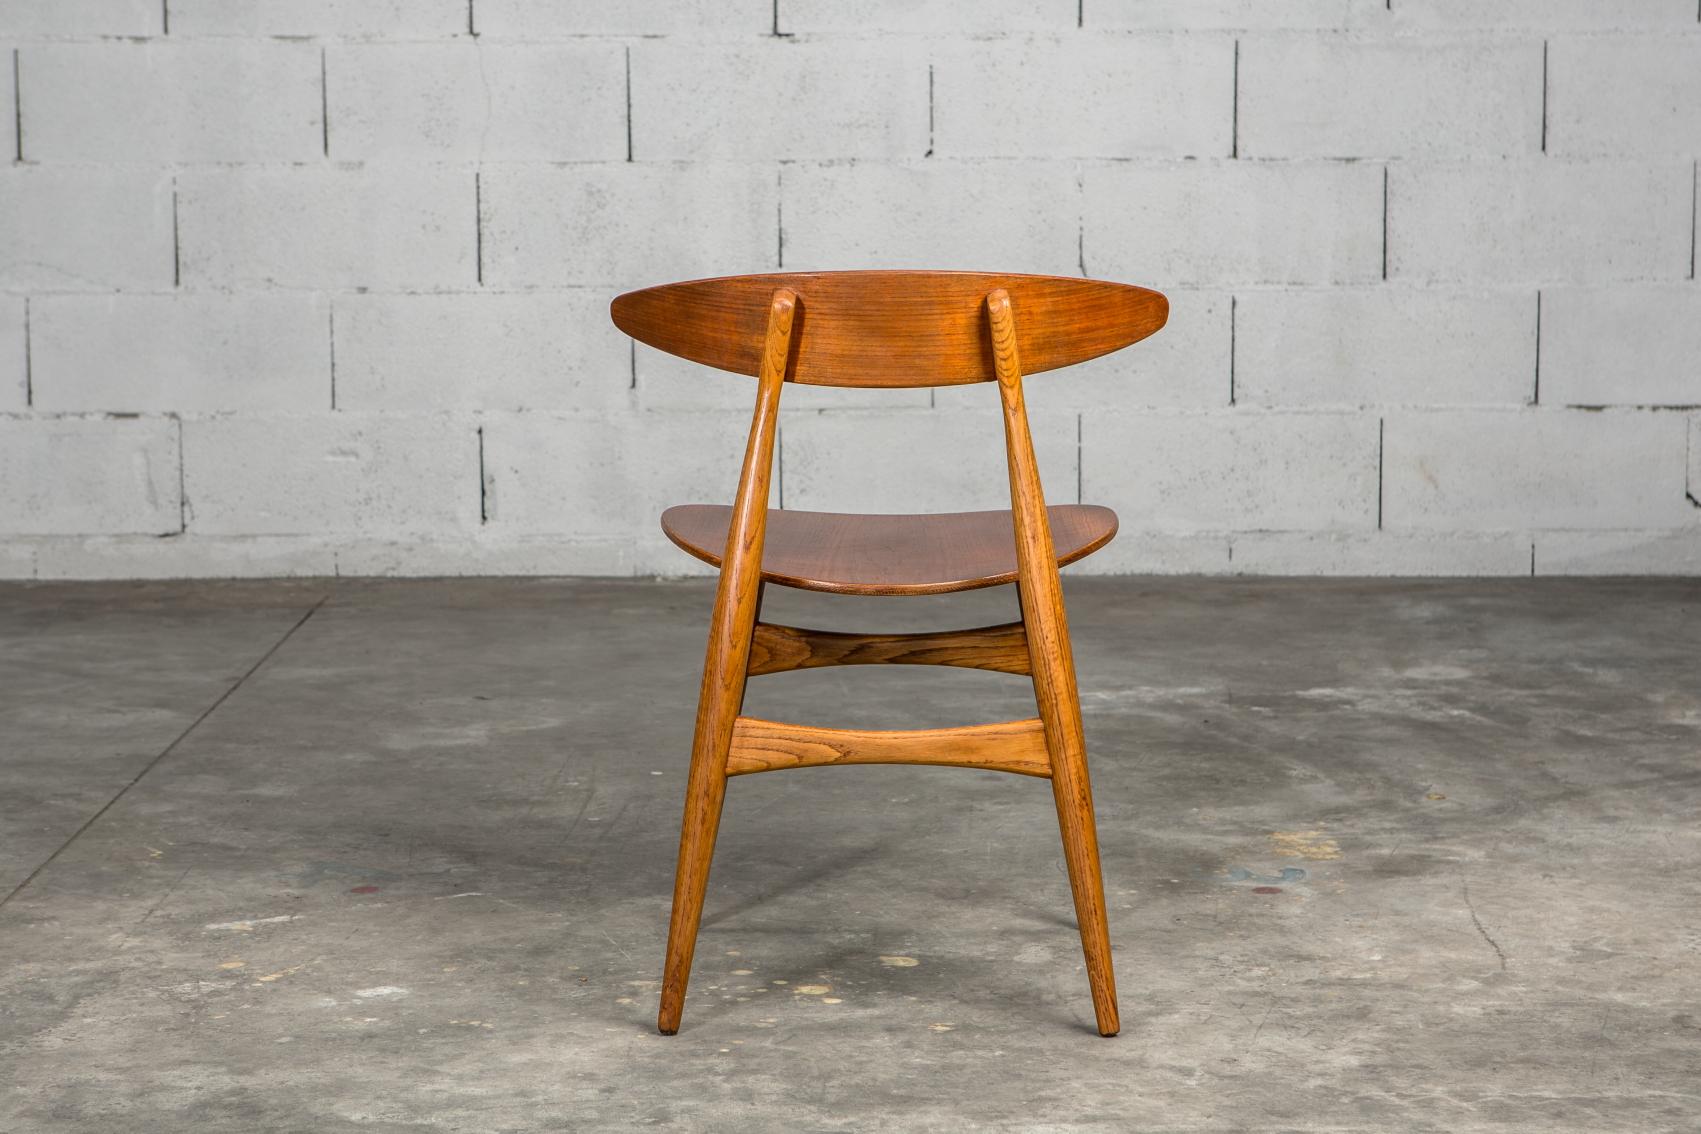 Molded teak backrests and oak frames CH 33 chairs - Hans J. Wegner for Carl Hansen & Son - Back view